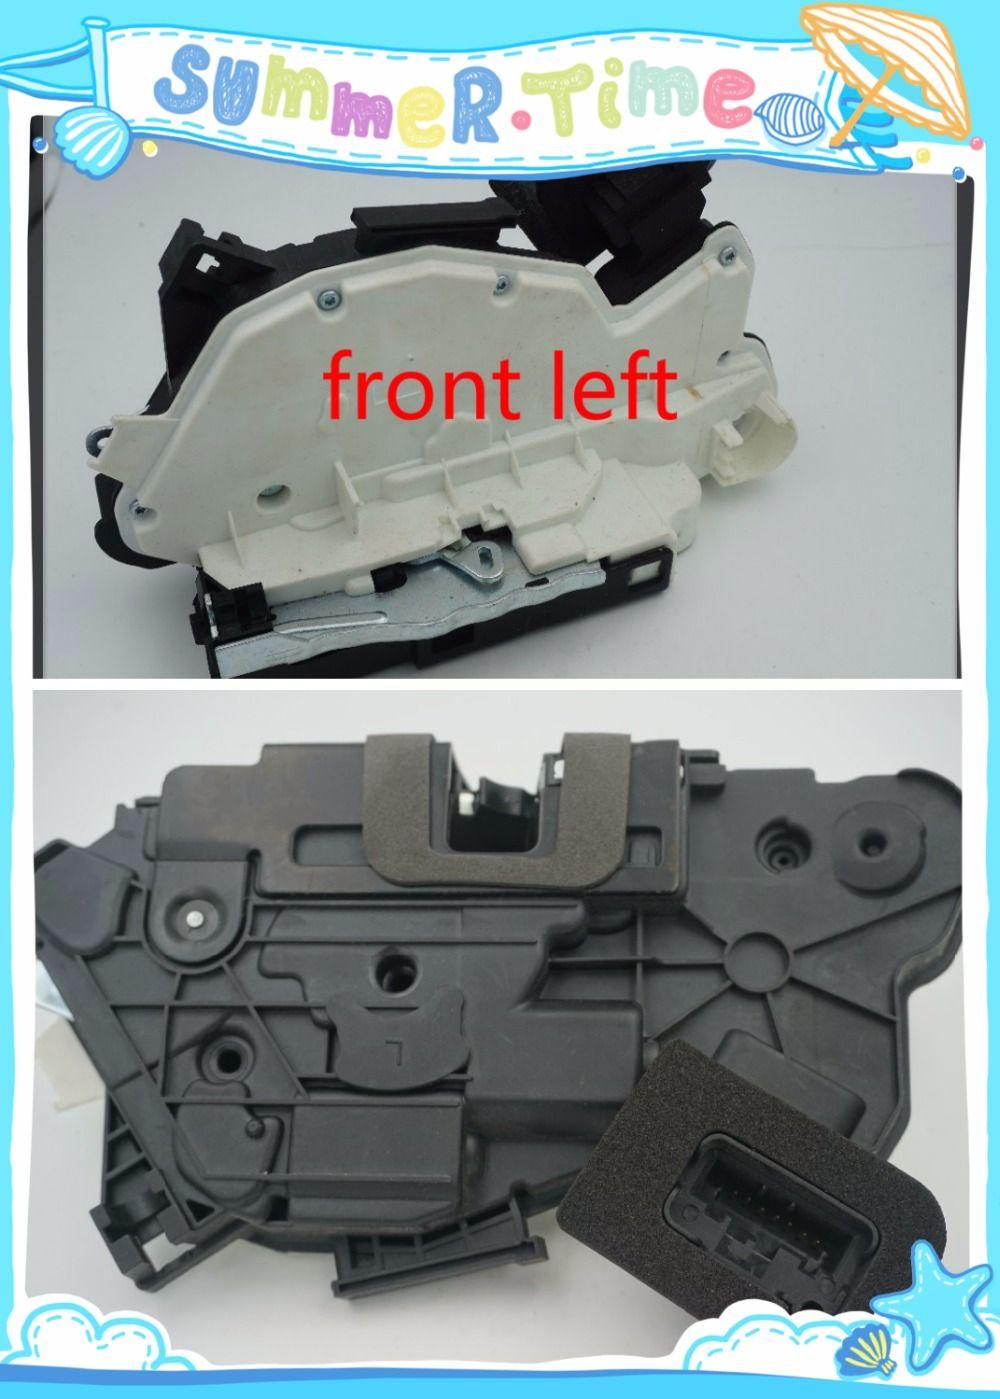 For Vw Golf Mk6 Mk7 Passat B7 Polo Skoda Yeti Door Lock Latch Actuator Driver Side Front Left 5k1 837 015 C 6rd 837 015 A Skoda Yeti Skoda Replacement Parts